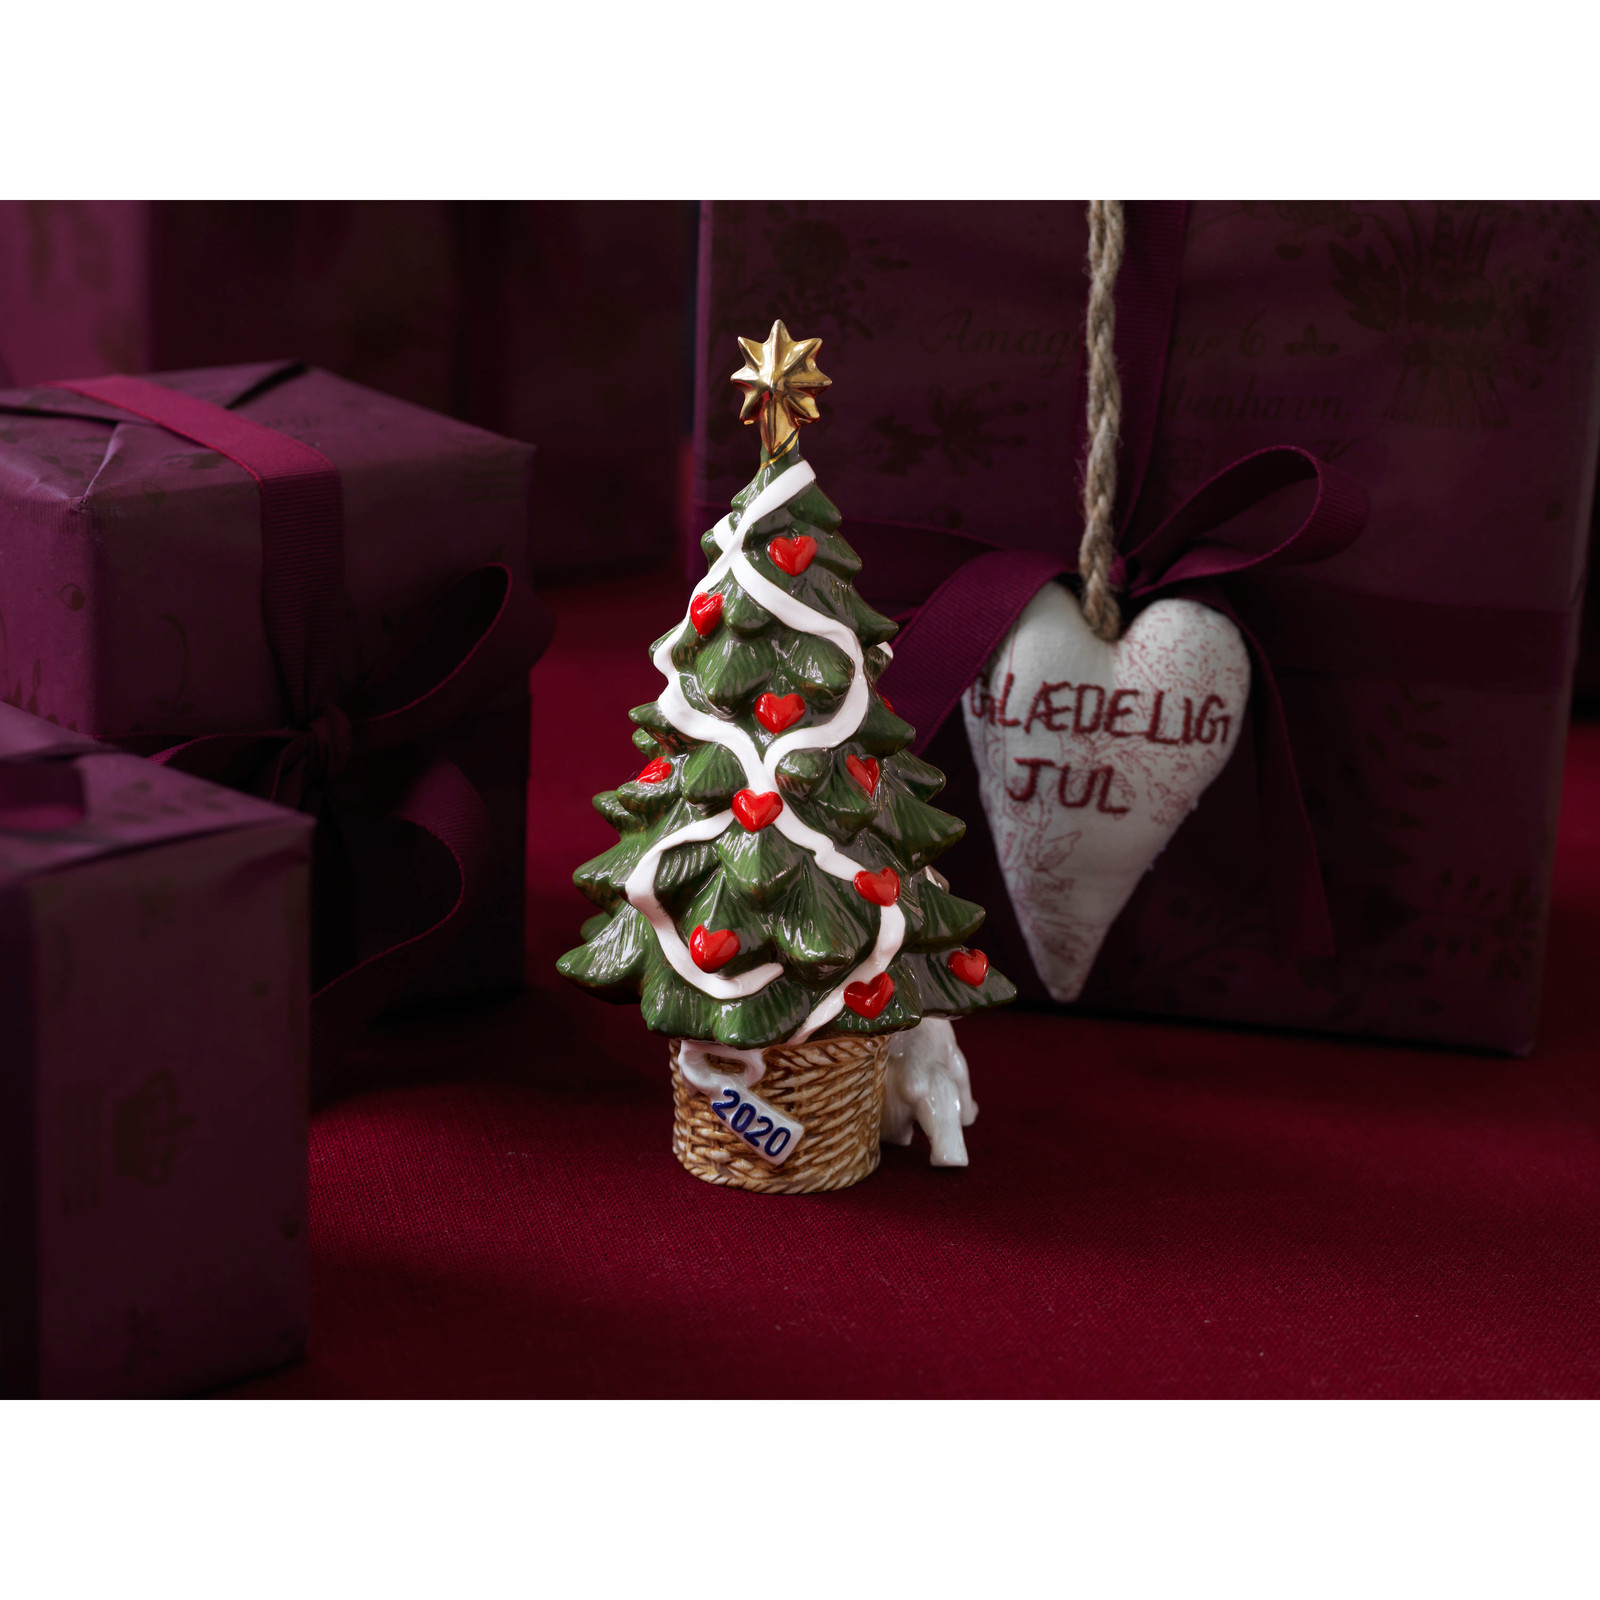 Royal Copenhagen 2020 Annual Christmas Tree Figurine (1051102)